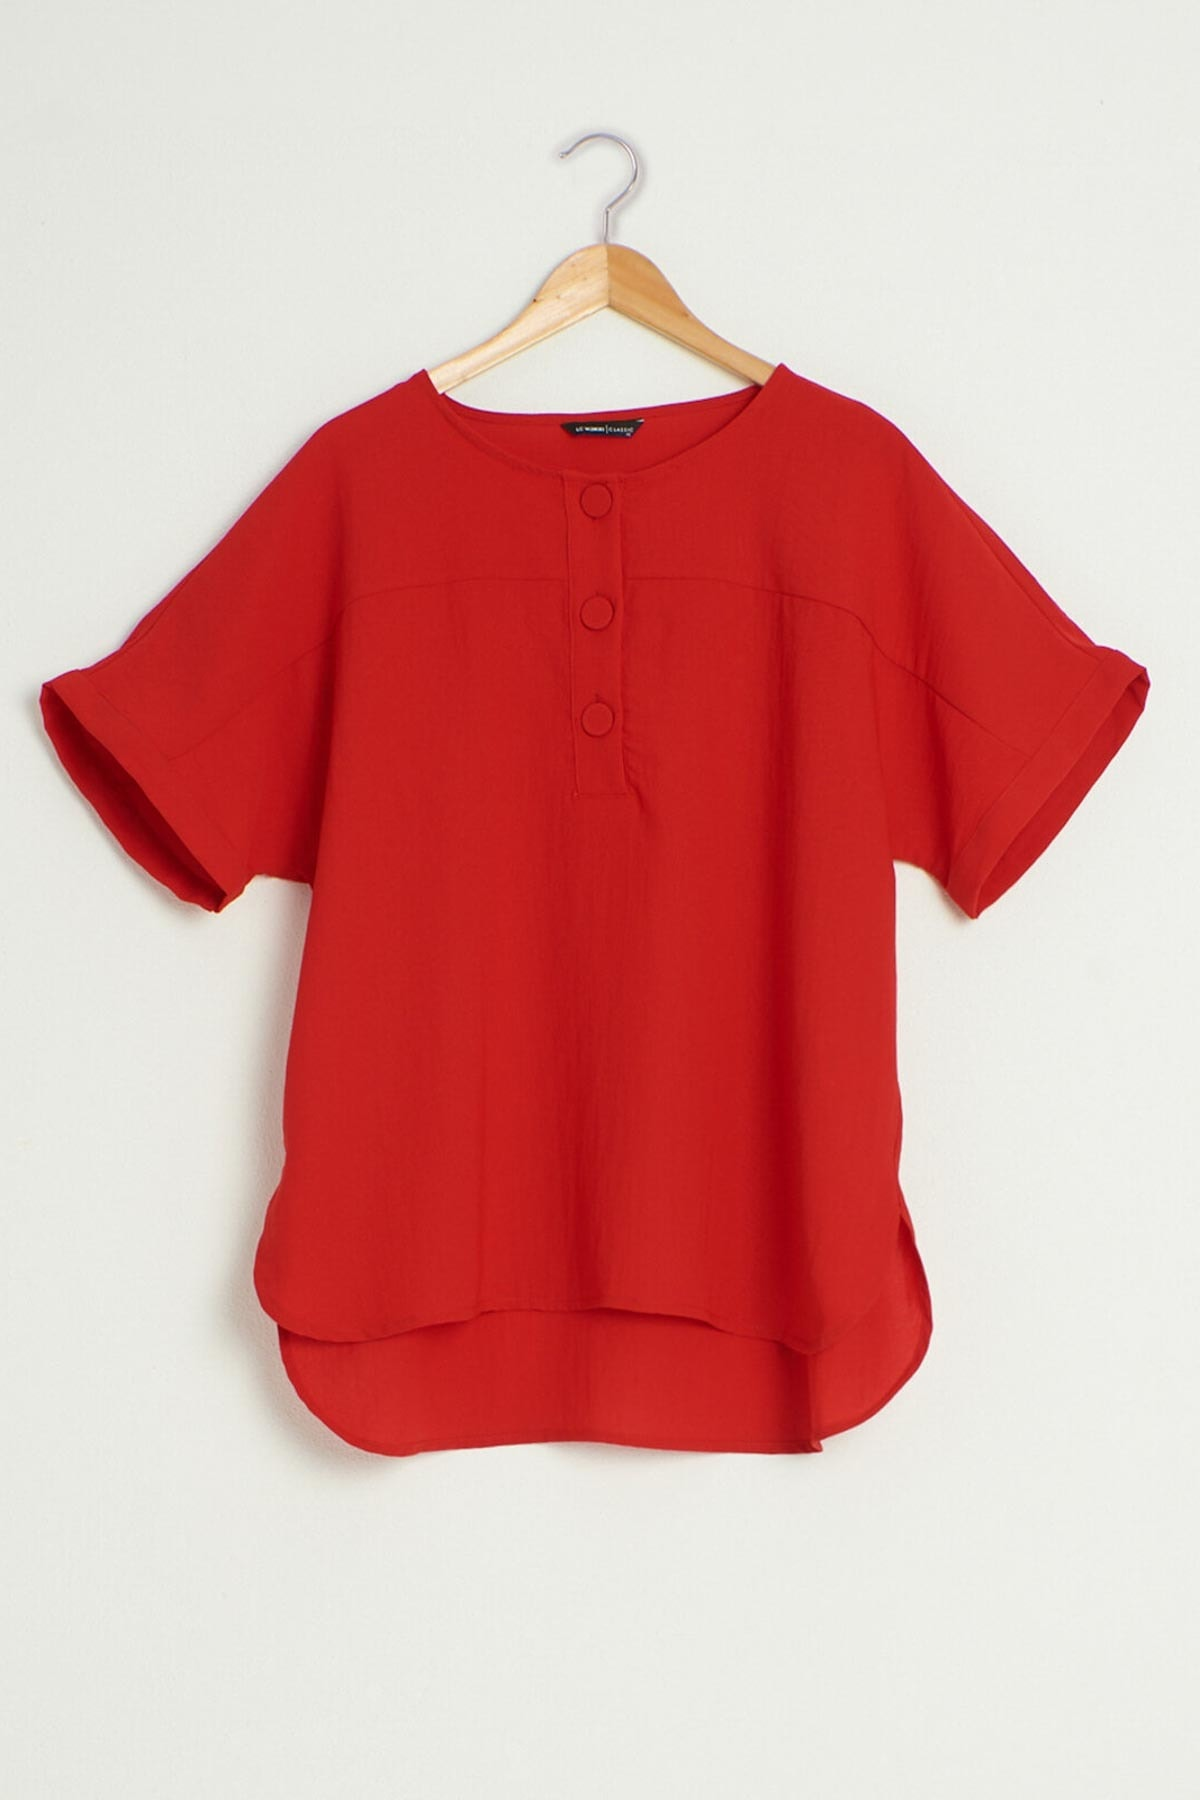 LC Waikiki Kadın Kırmızı Bluz 0WDI16Z8 1